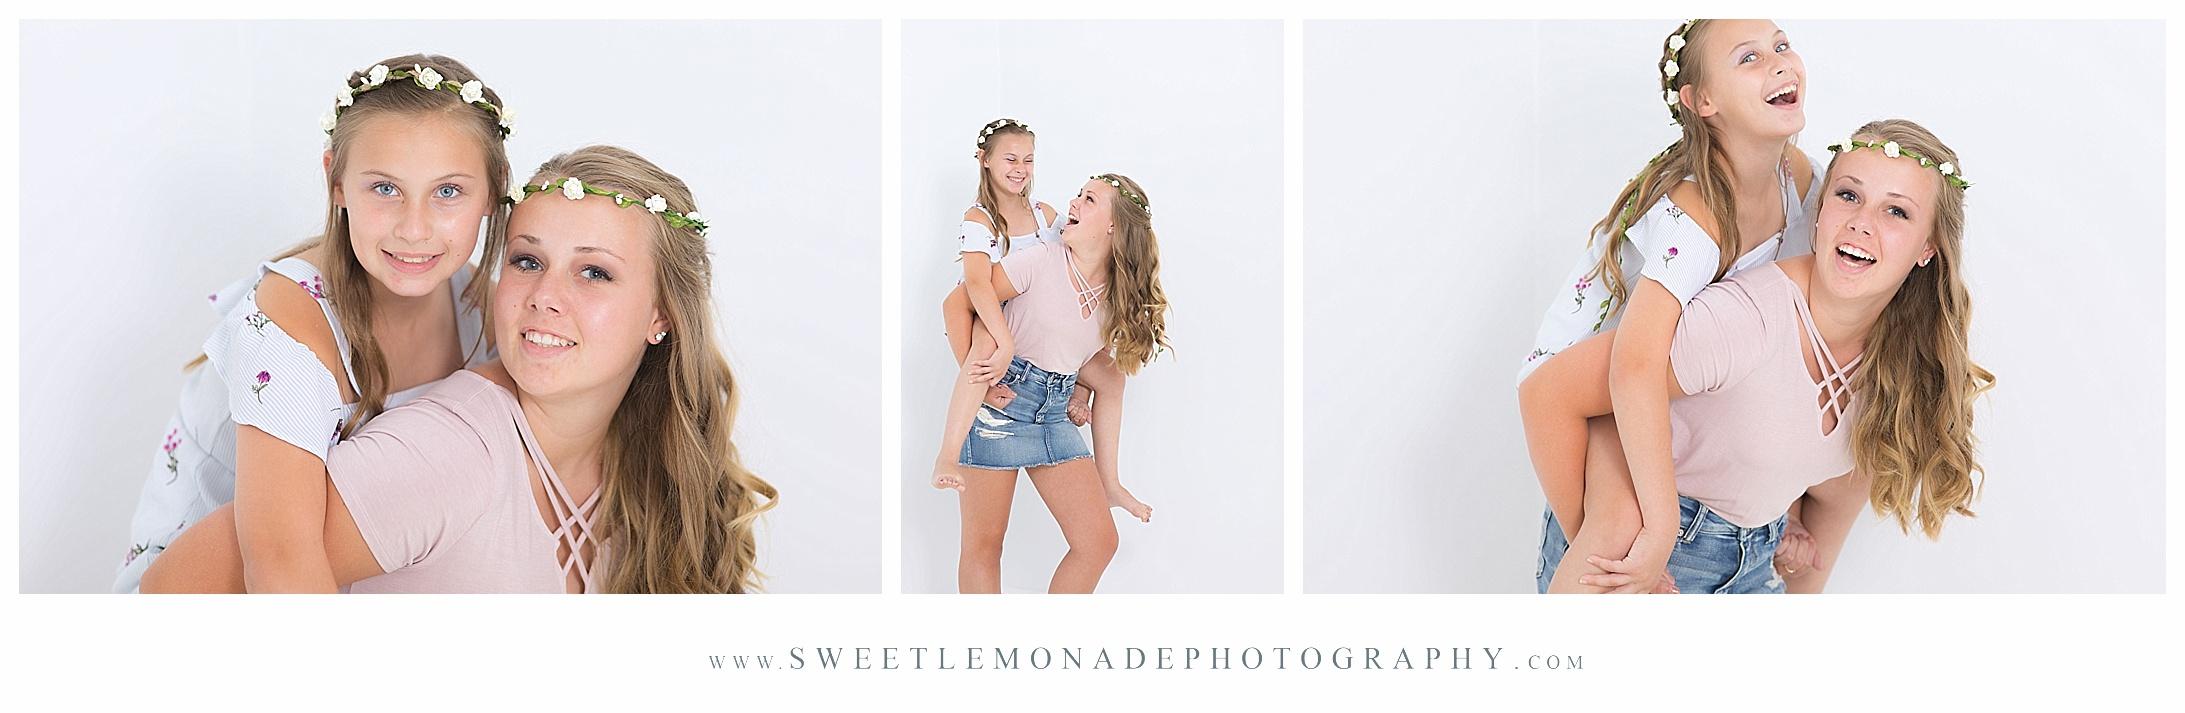 champaign-senior-photographer-sweet-lemonade-photography-floral-crown-tween-pictures_2249.jpg